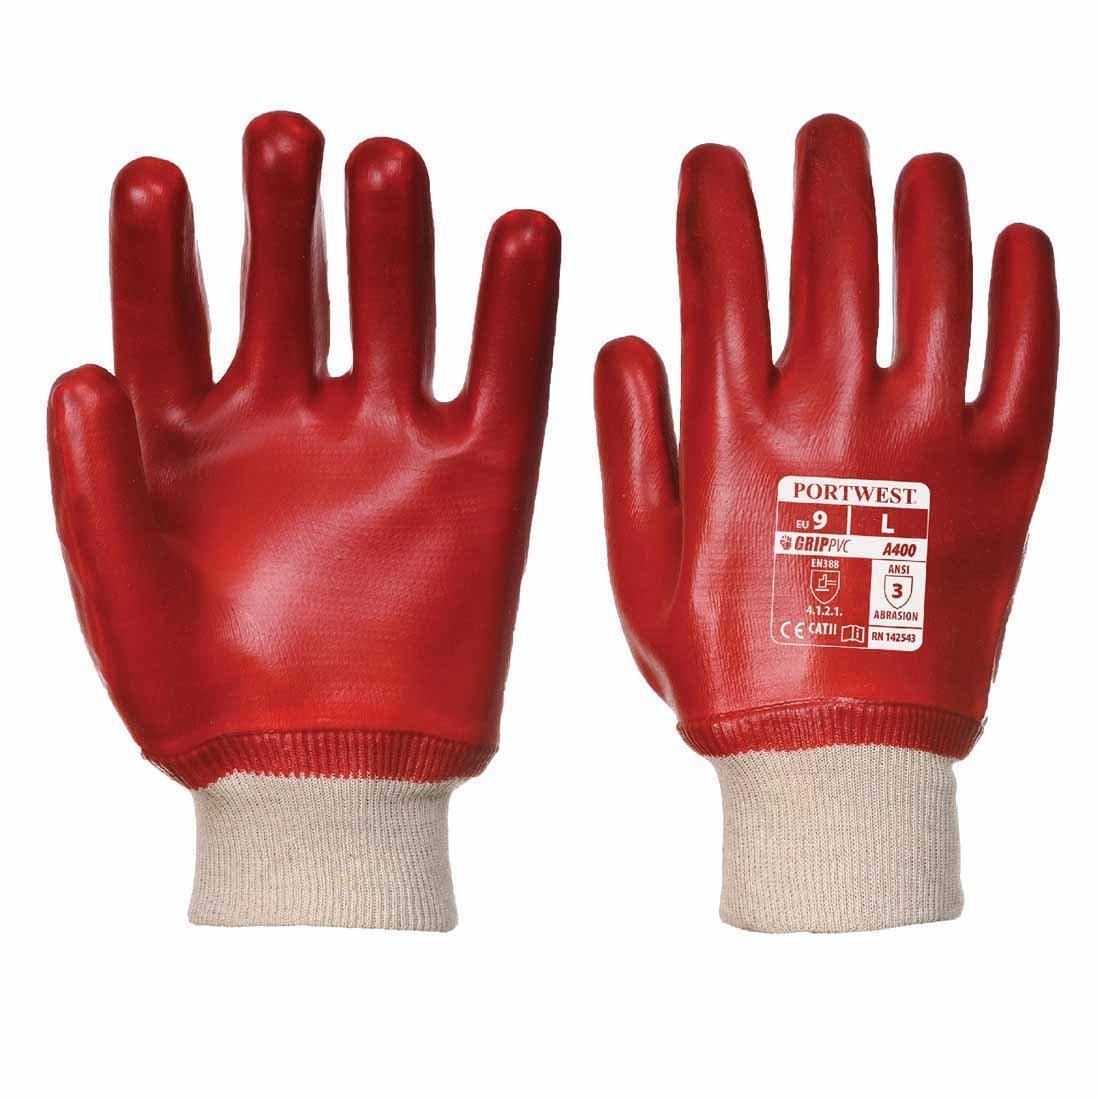 Portwest A400 PVC Knitwrist Work Gloves Red XL